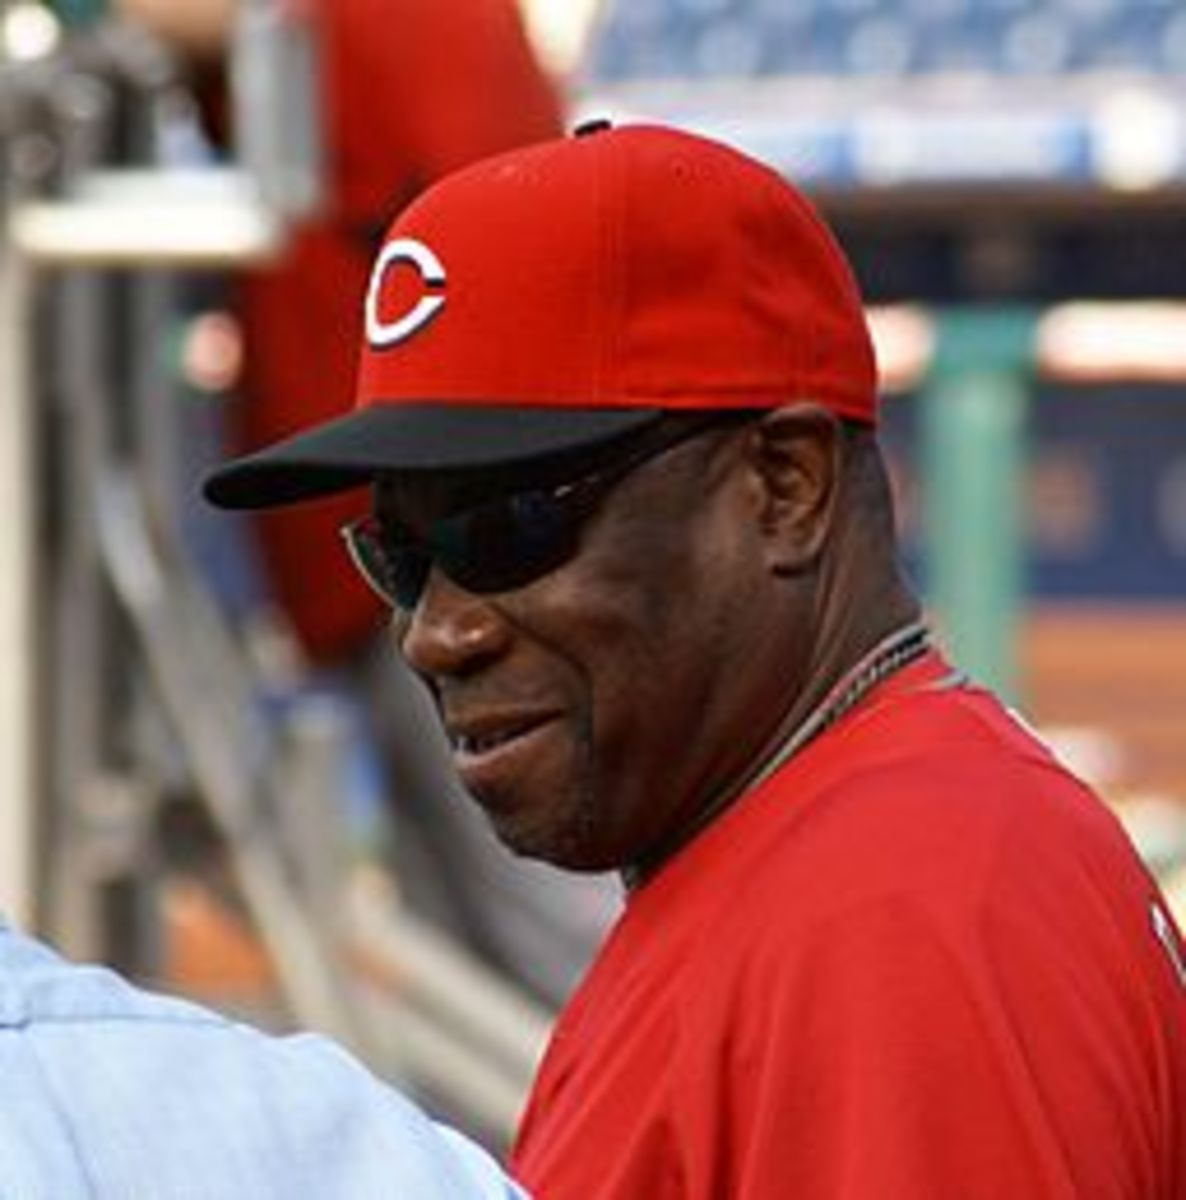 Cincinnati Reds Manager